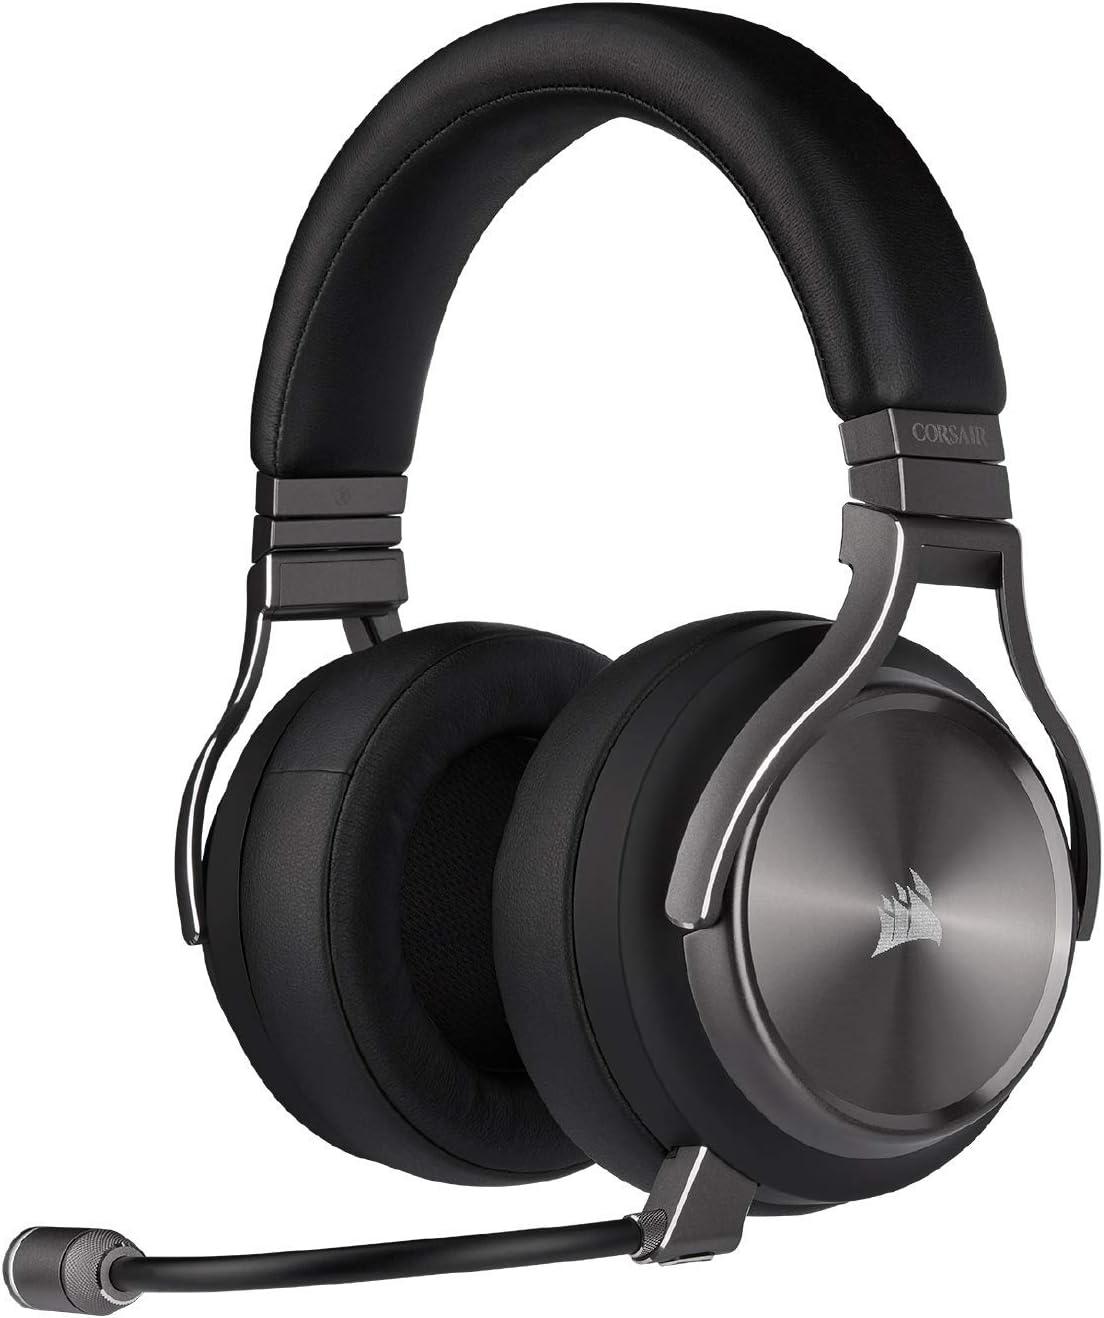 Corsair CA-9011180-NA Genuine Virtuoso RGB Wireless Gaming Se - Headset Many popular brands